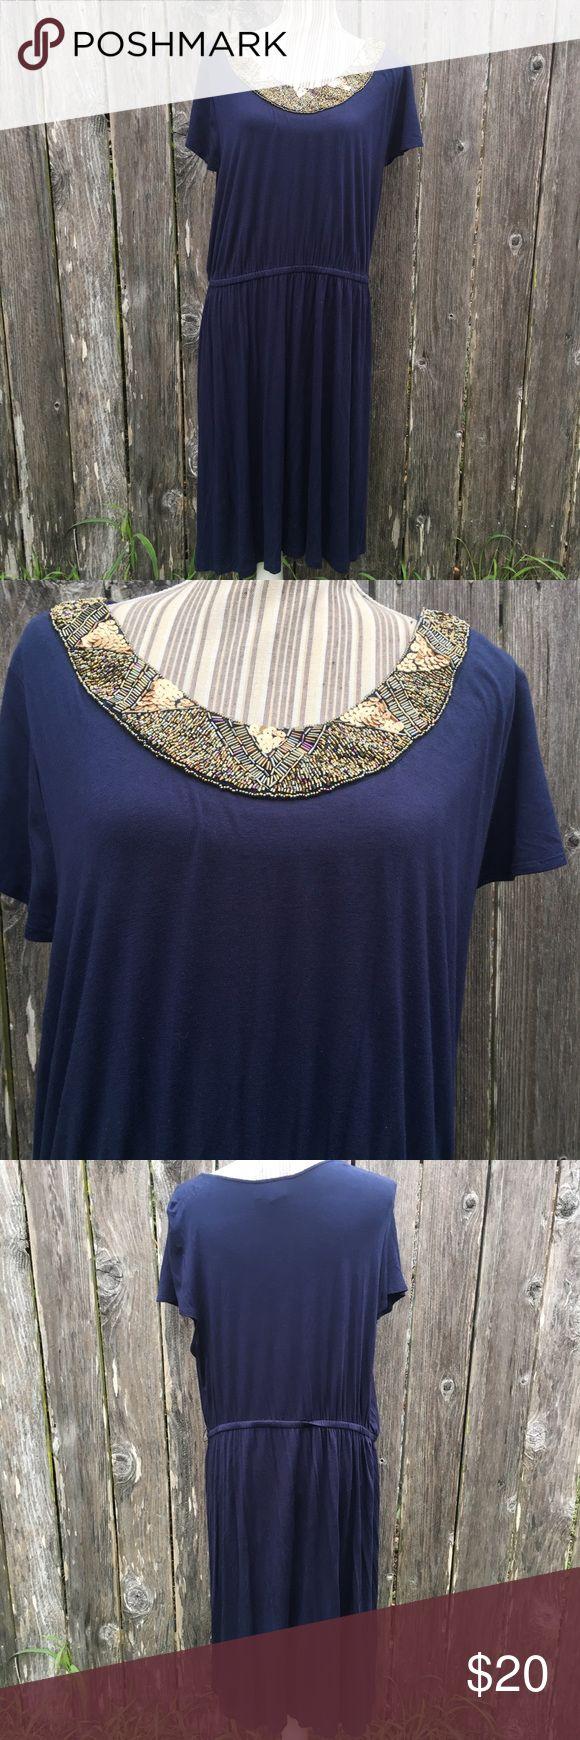 Lane Bryant Navy Blue Dress Gold Neck Trim 18/20 Lane Bryant Navy Blue Dress Gold Neck Trim Size 18/20 excellent condition from a smoke free home Lane Bryant Dresses